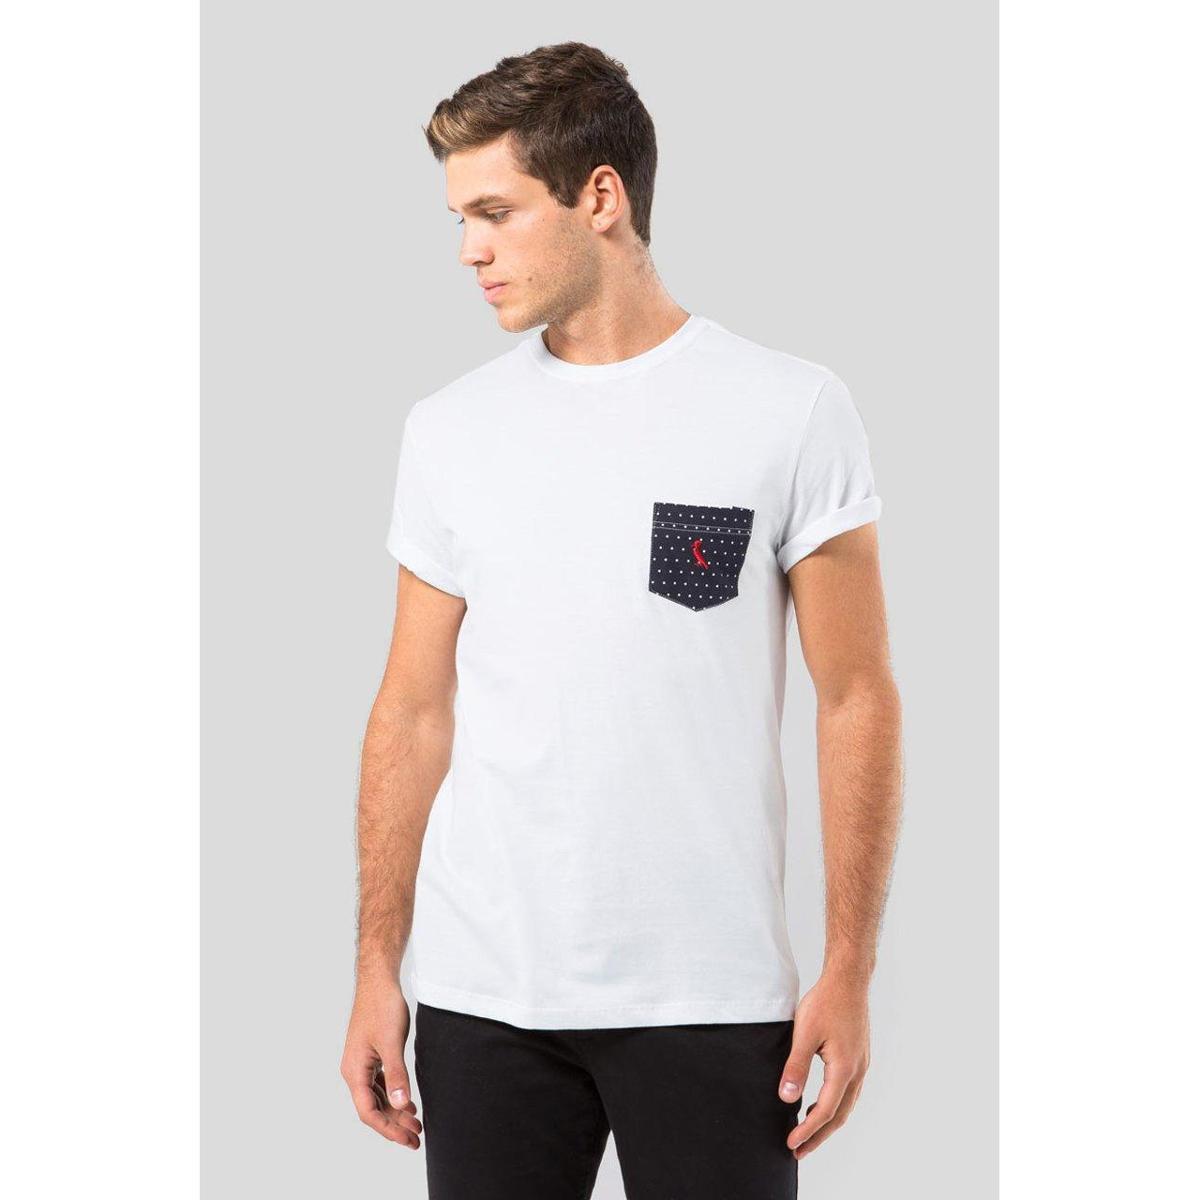 Camiseta Malha Variada Bolso 577 Bordado Reserva Masculina - Branco